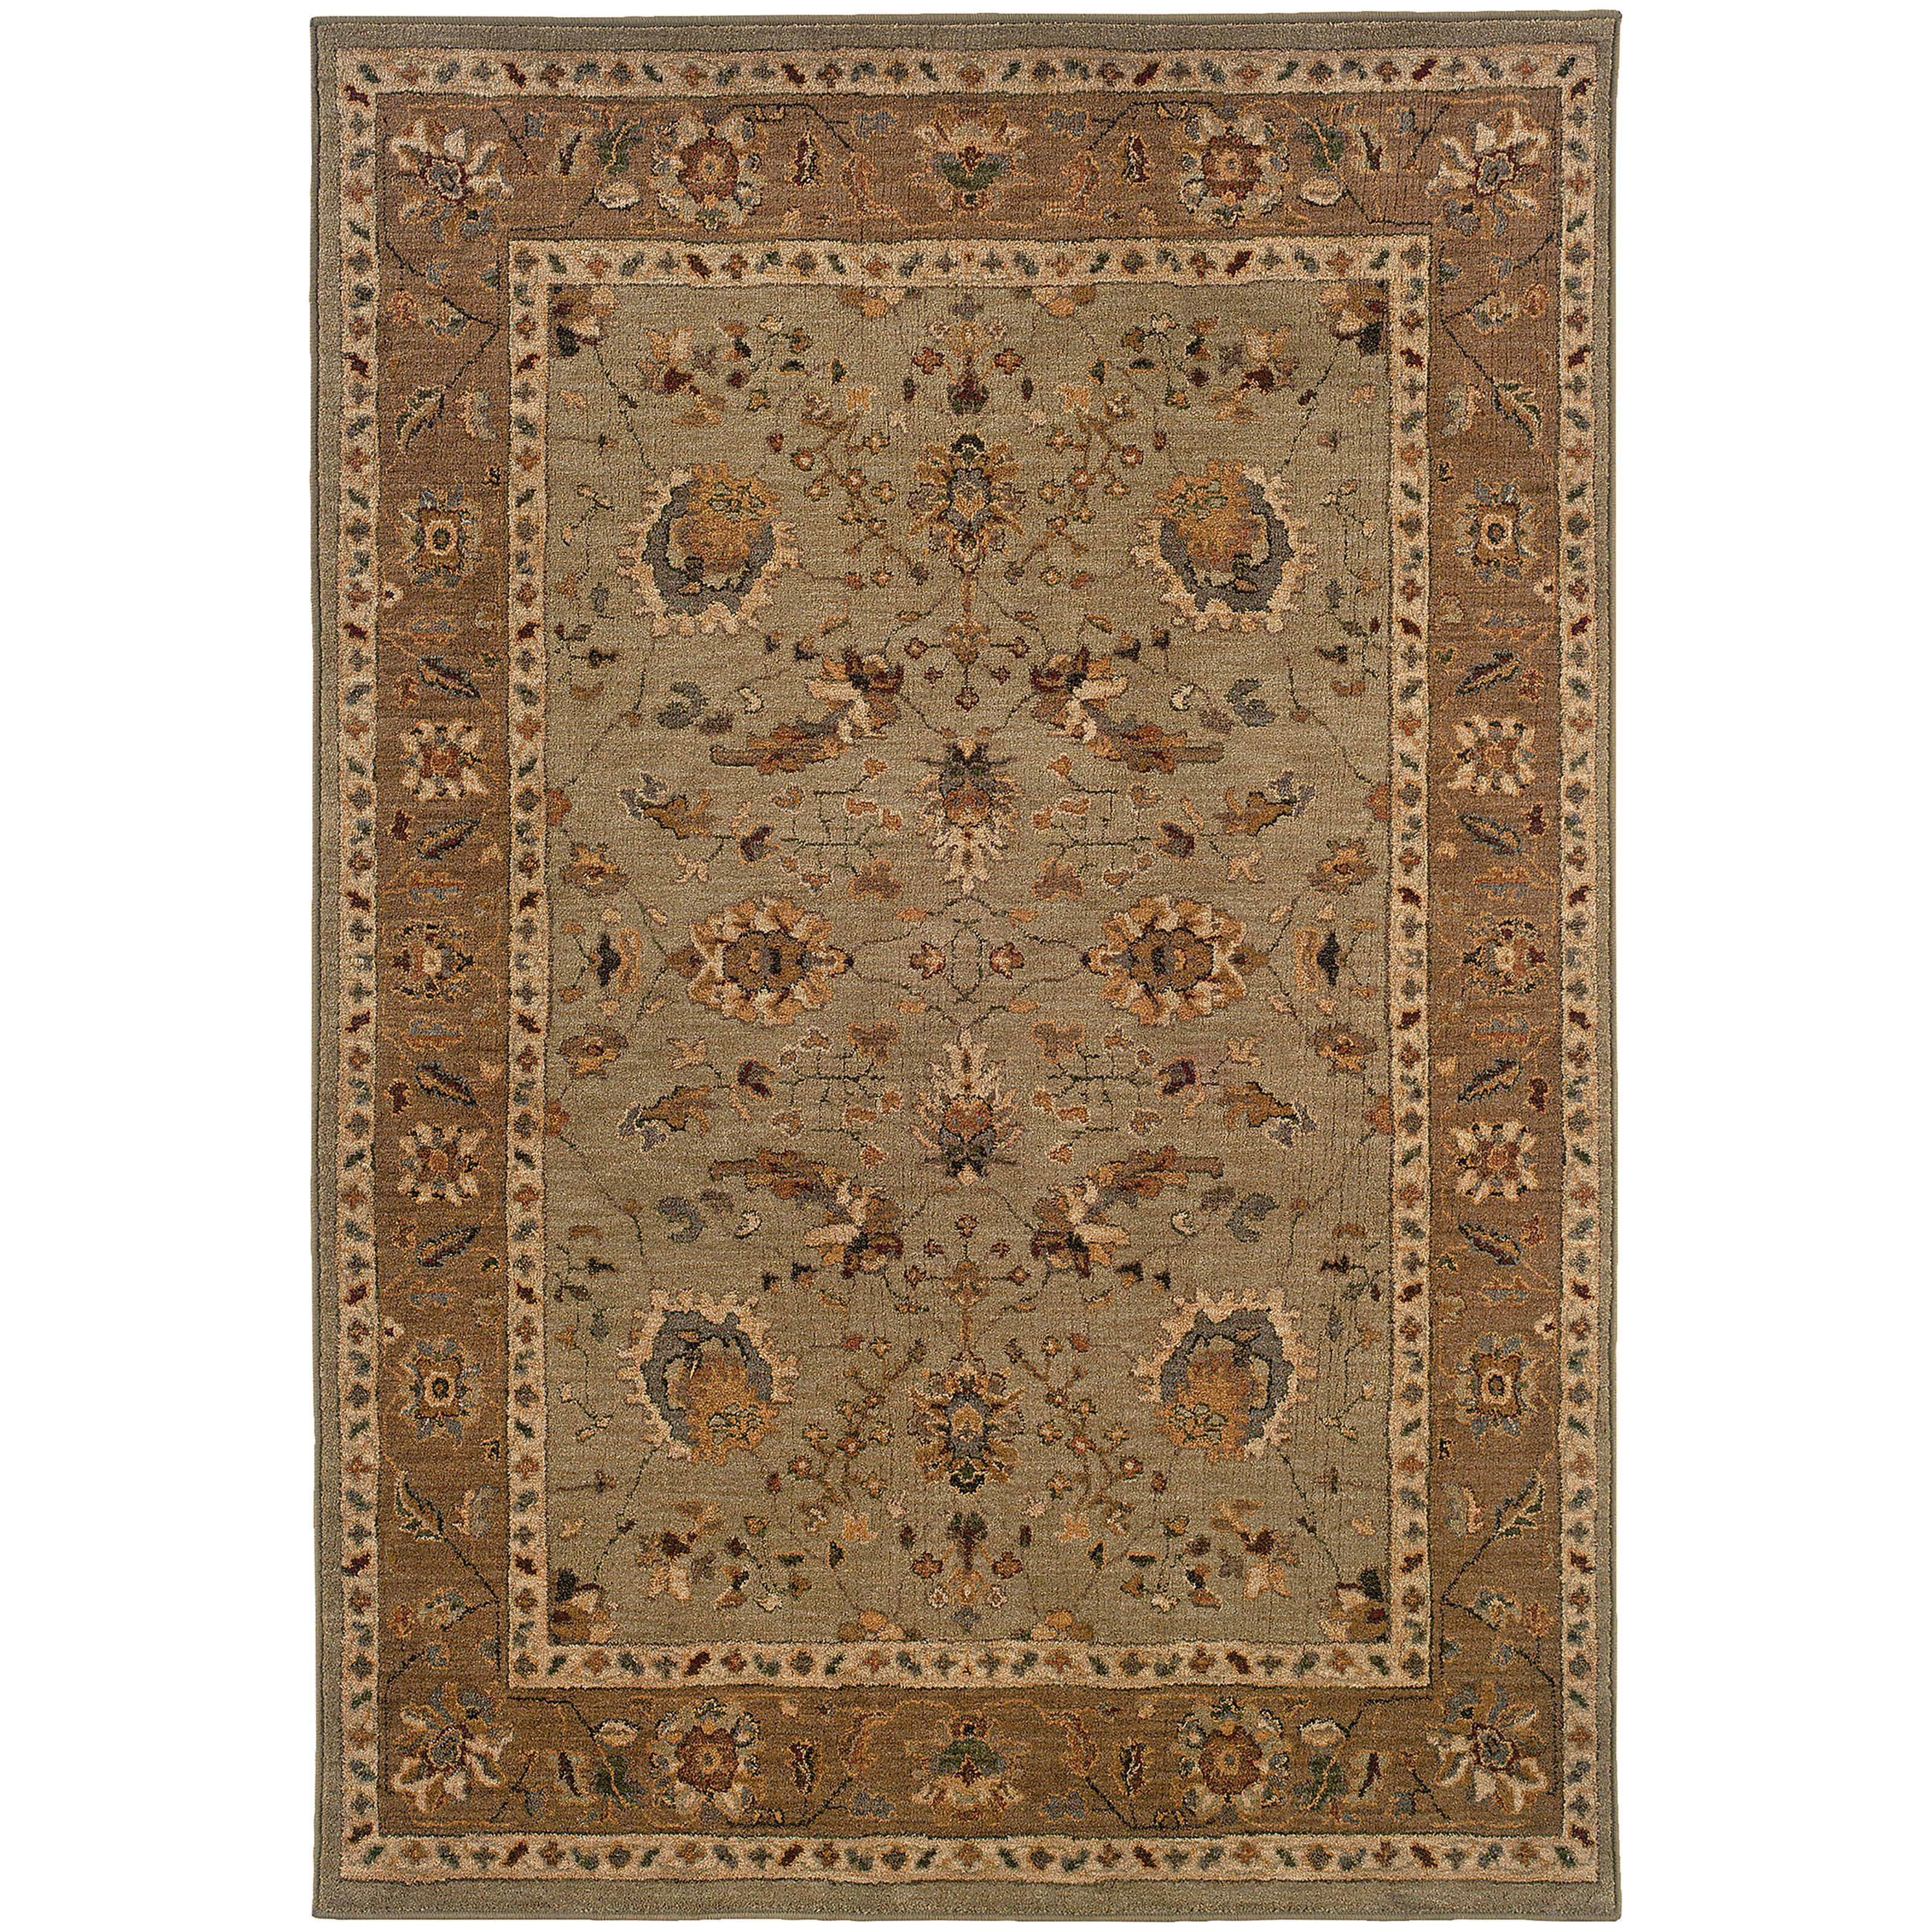 "Oriental Weavers Infinity 9'10"" X 12' 9"" Rug - Item Number: I1104C300390ST"